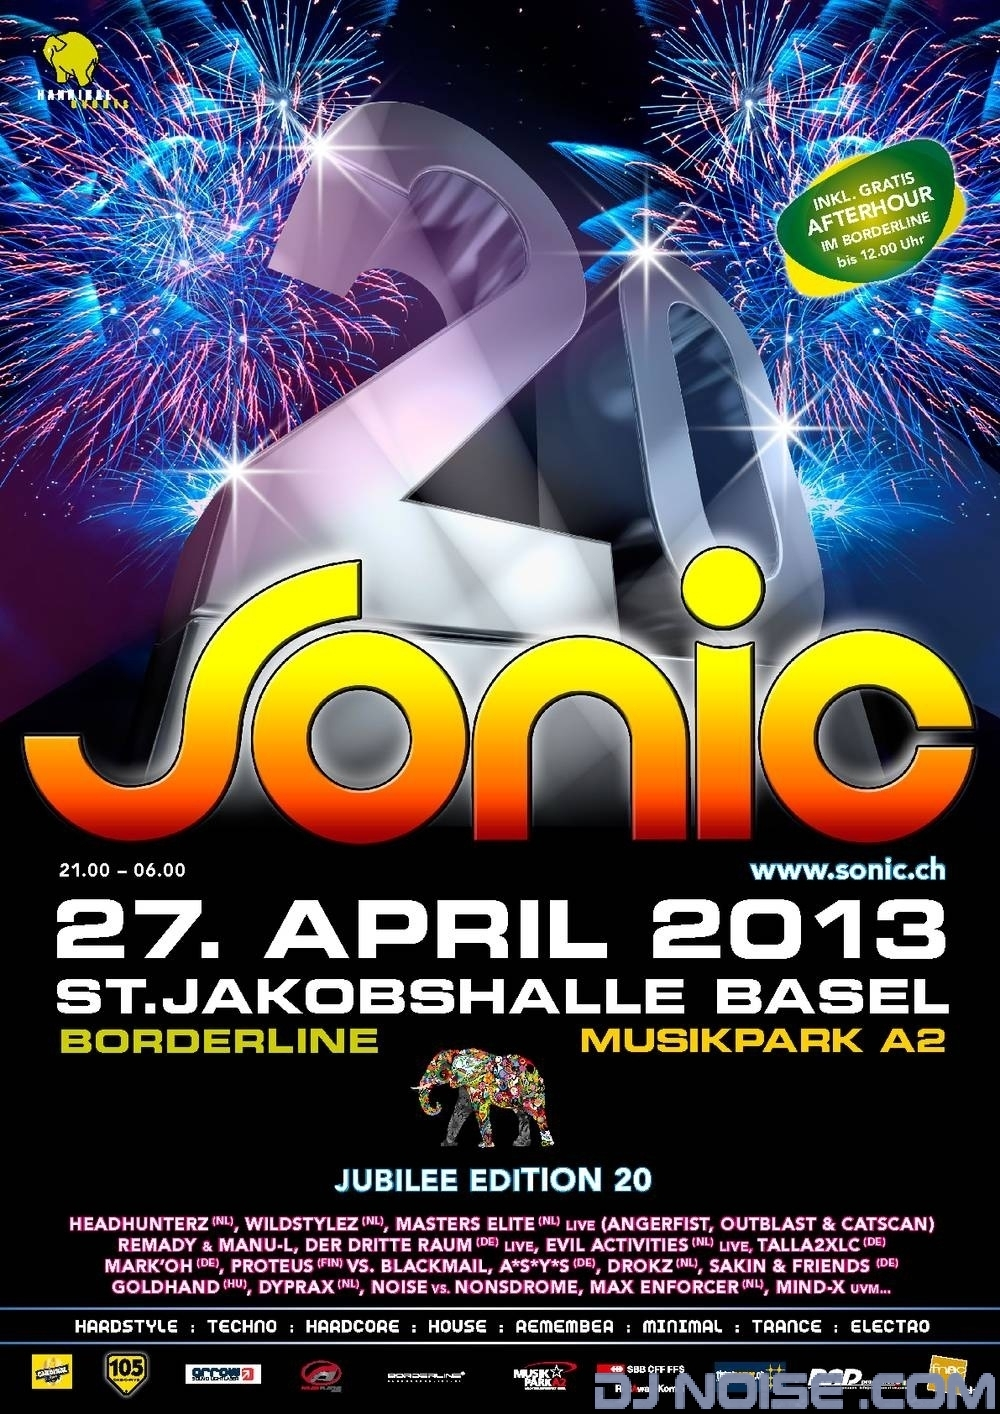 2013.04.27 Sonic20 Plakat